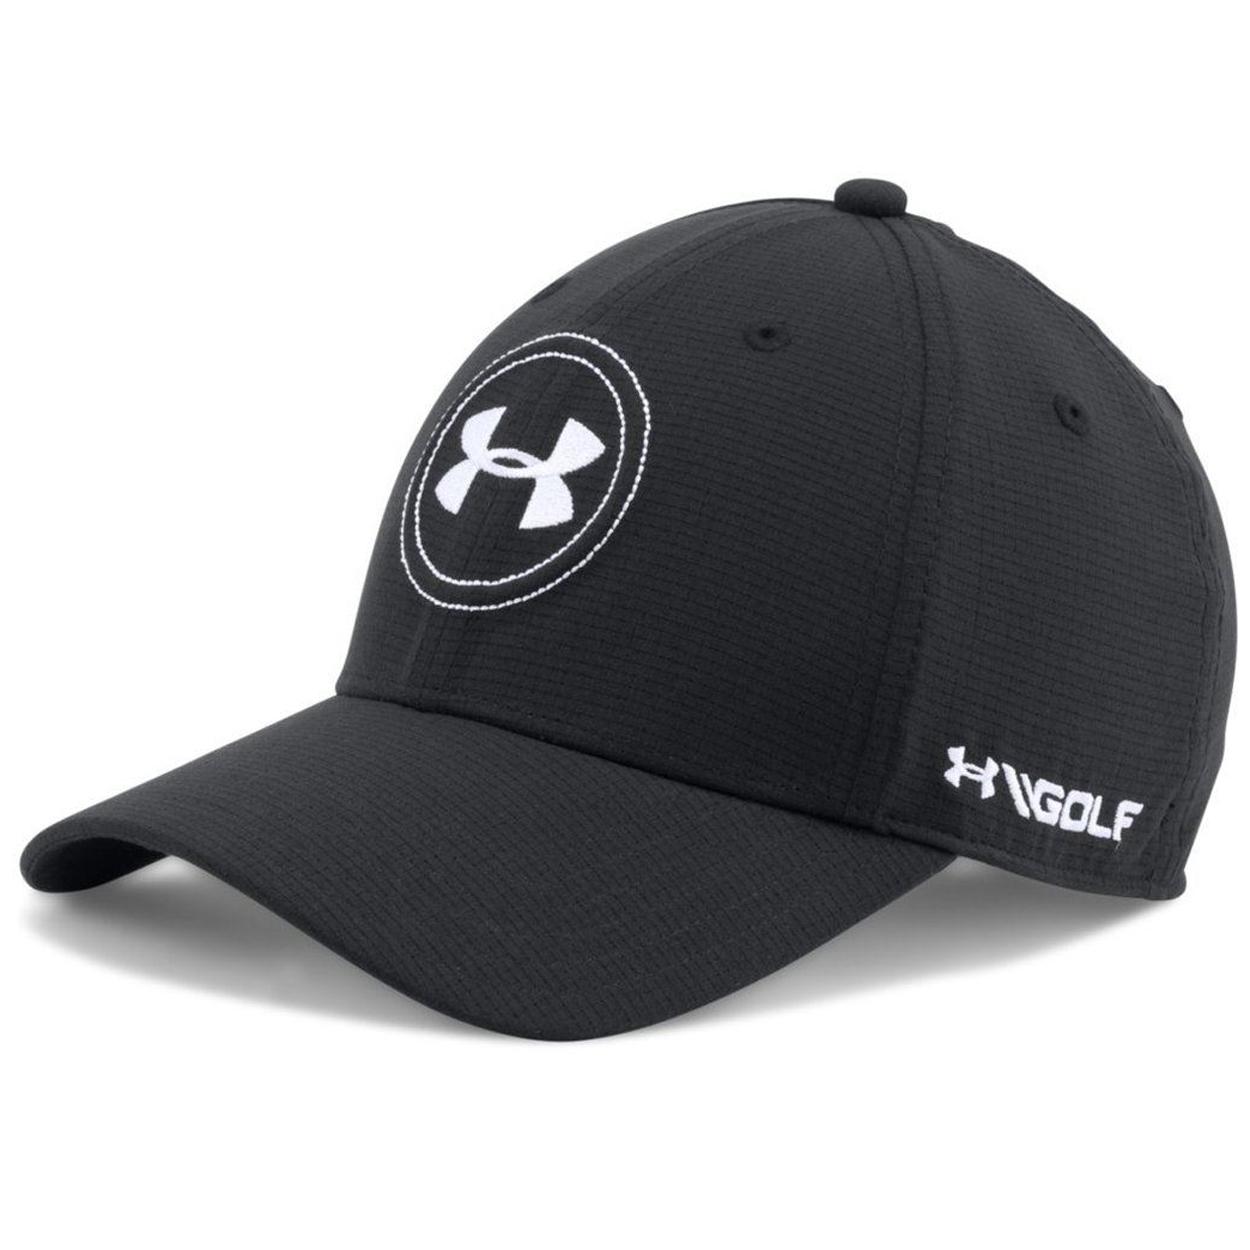 Under Armour Tour 2.0 Stretch Fit Golf Hat - GolfEtail.com 14b65e65643